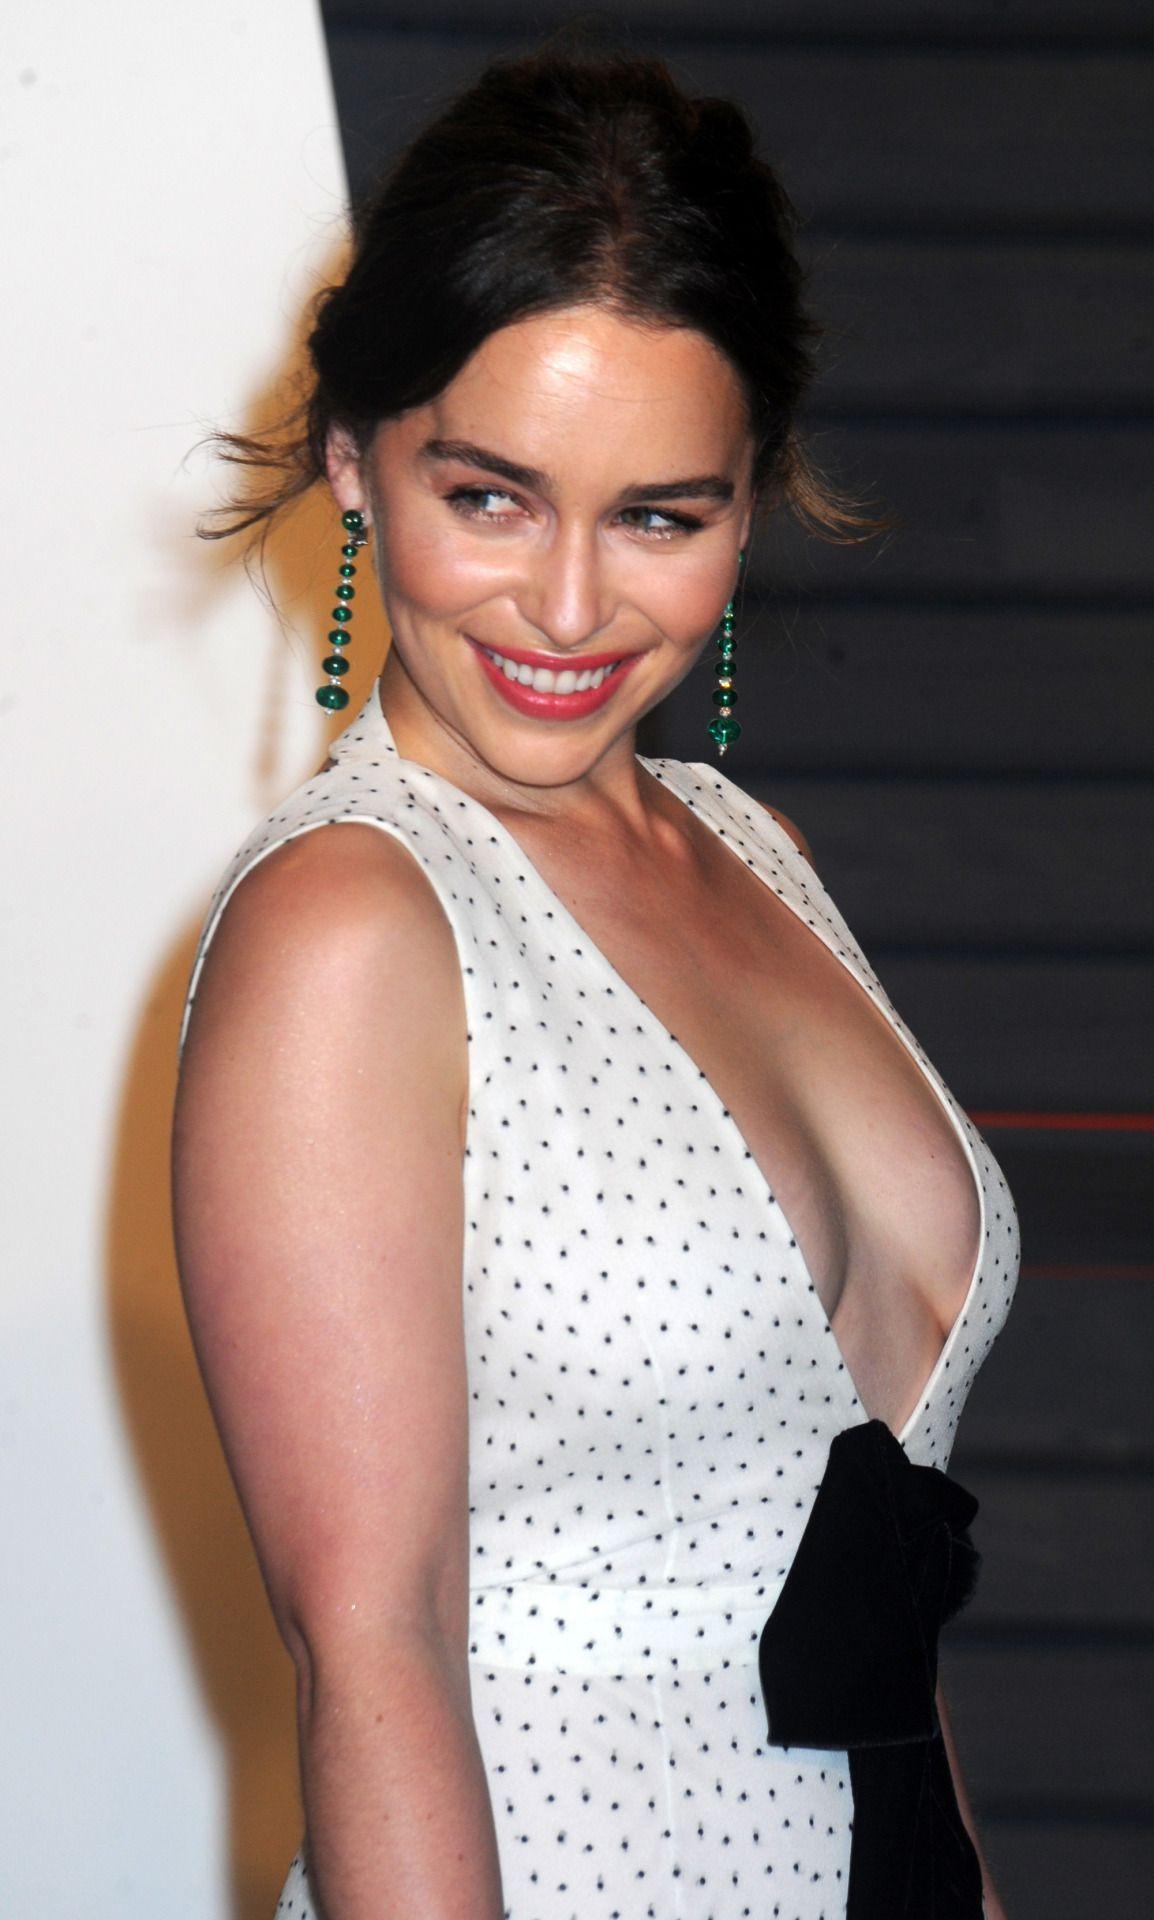 Snapchat Emilia Clarke nudes (58 foto and video), Pussy, Paparazzi, Instagram, in bikini 2015